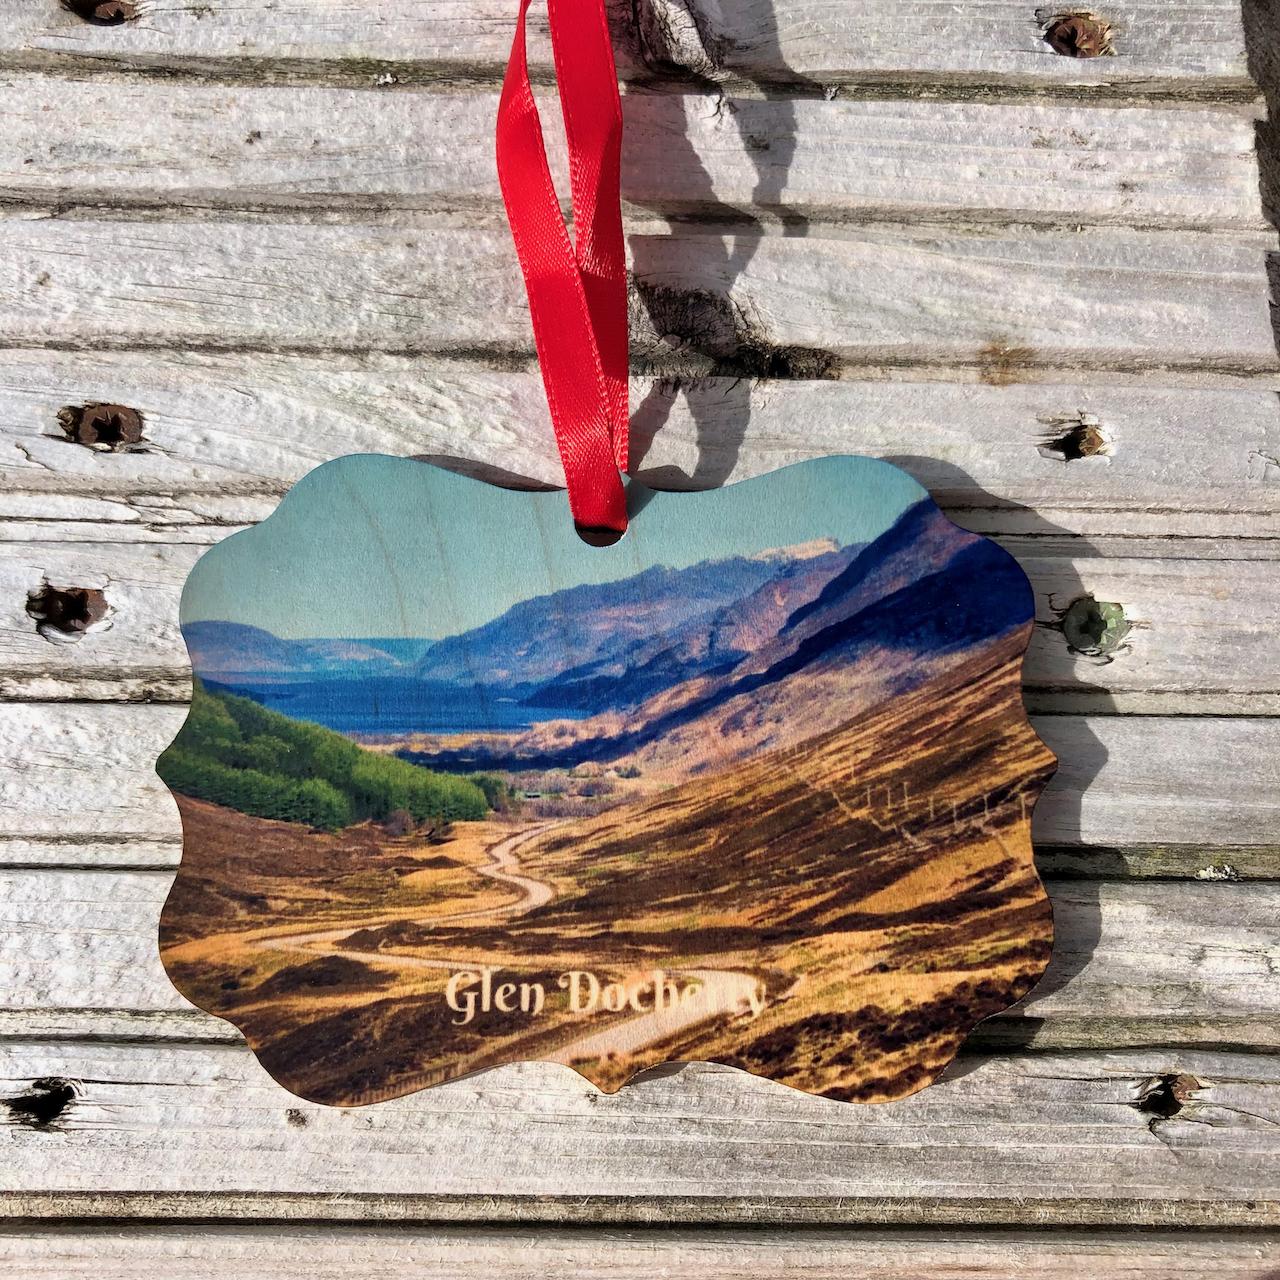 Xmas: Wooden Ornament Glen Docherty